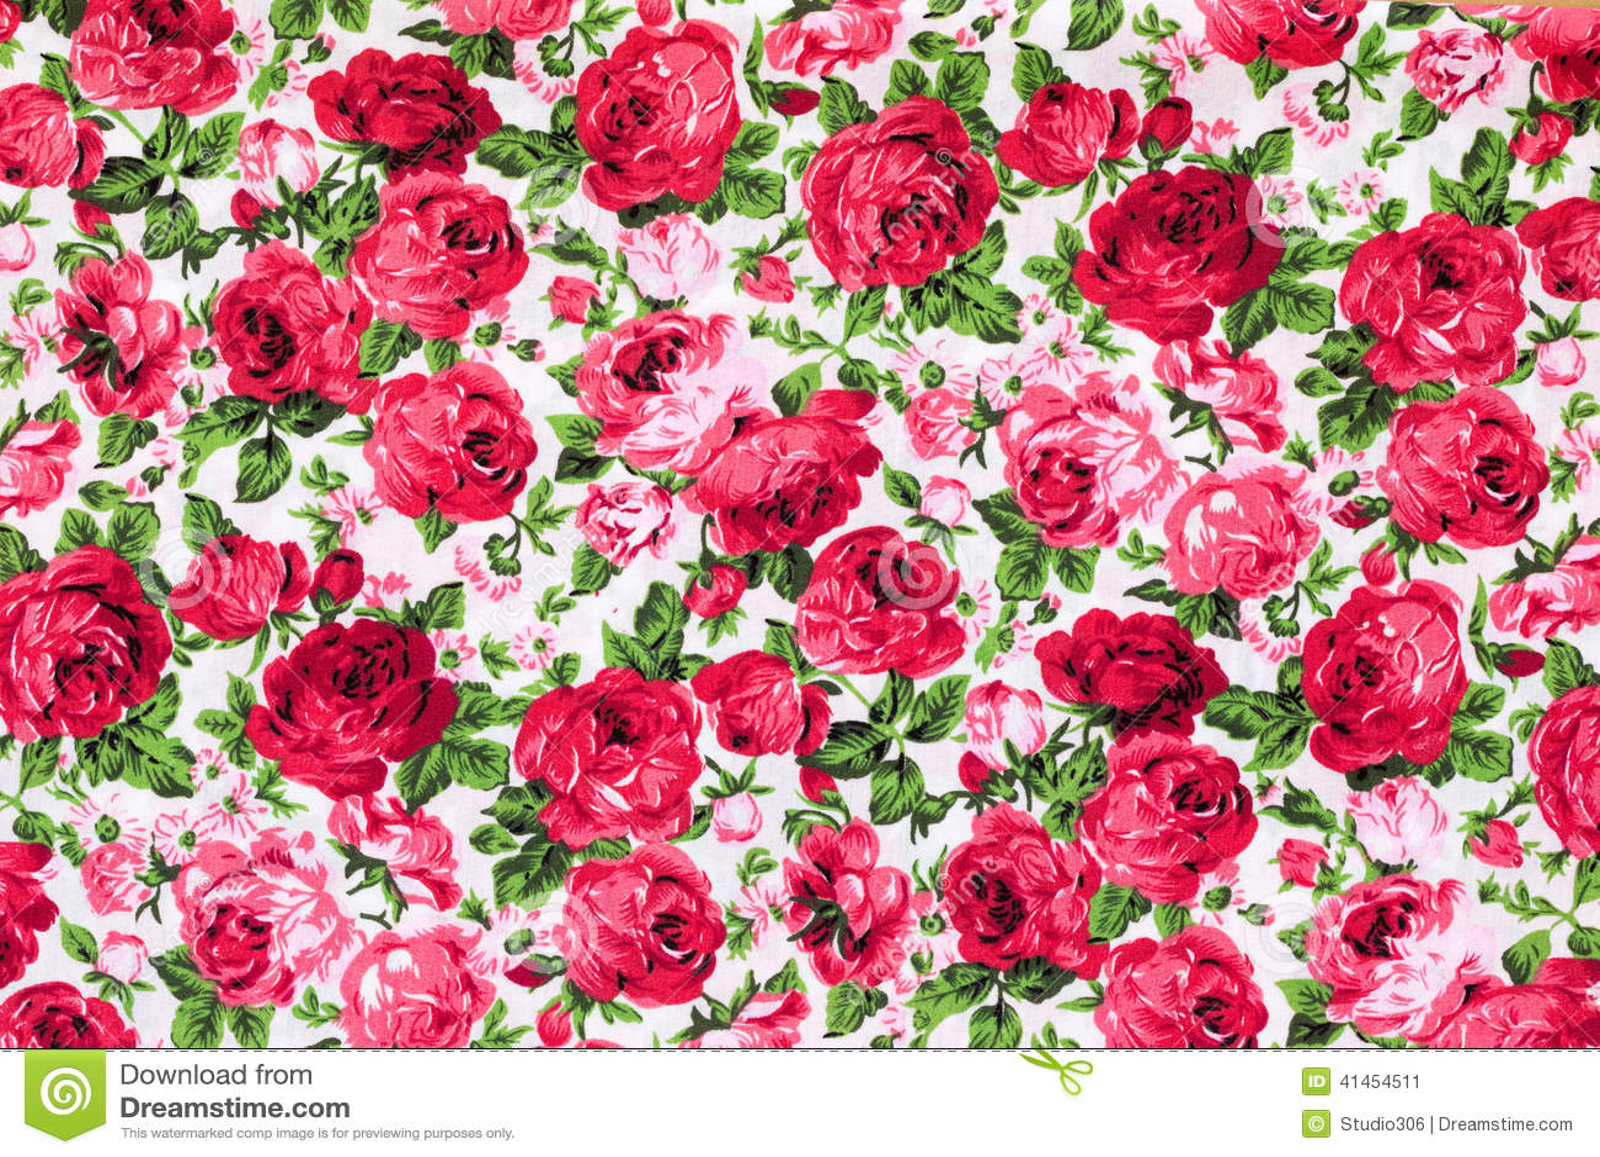 Vintage Floral Textile Pattern Stock Image - Image: 41454511